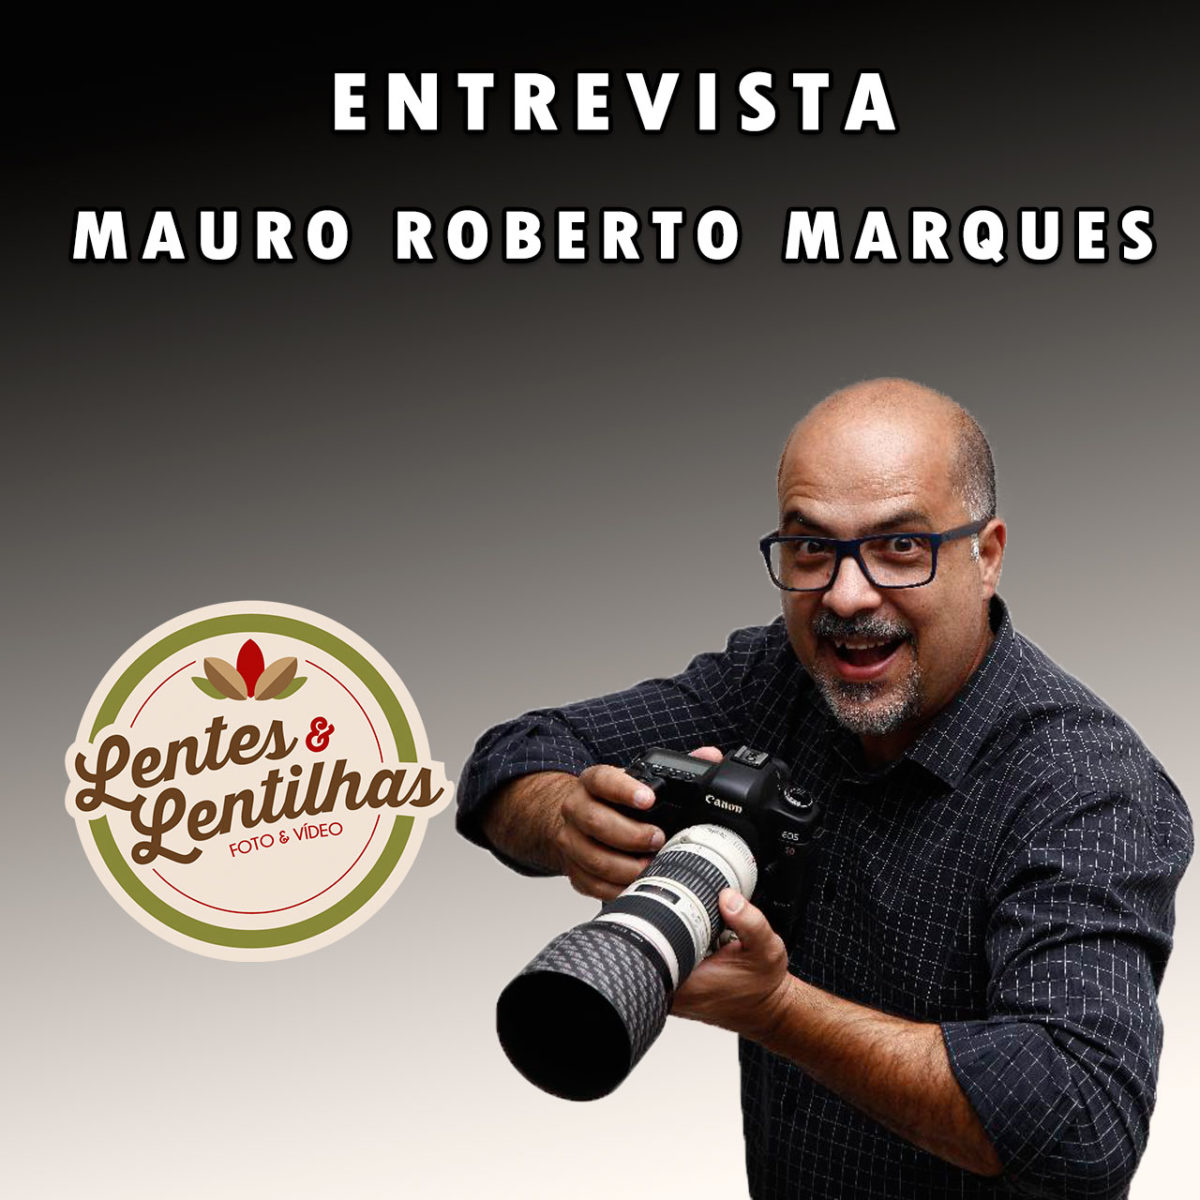 Entrevista Mauro Roberto Marques - O Fotorista